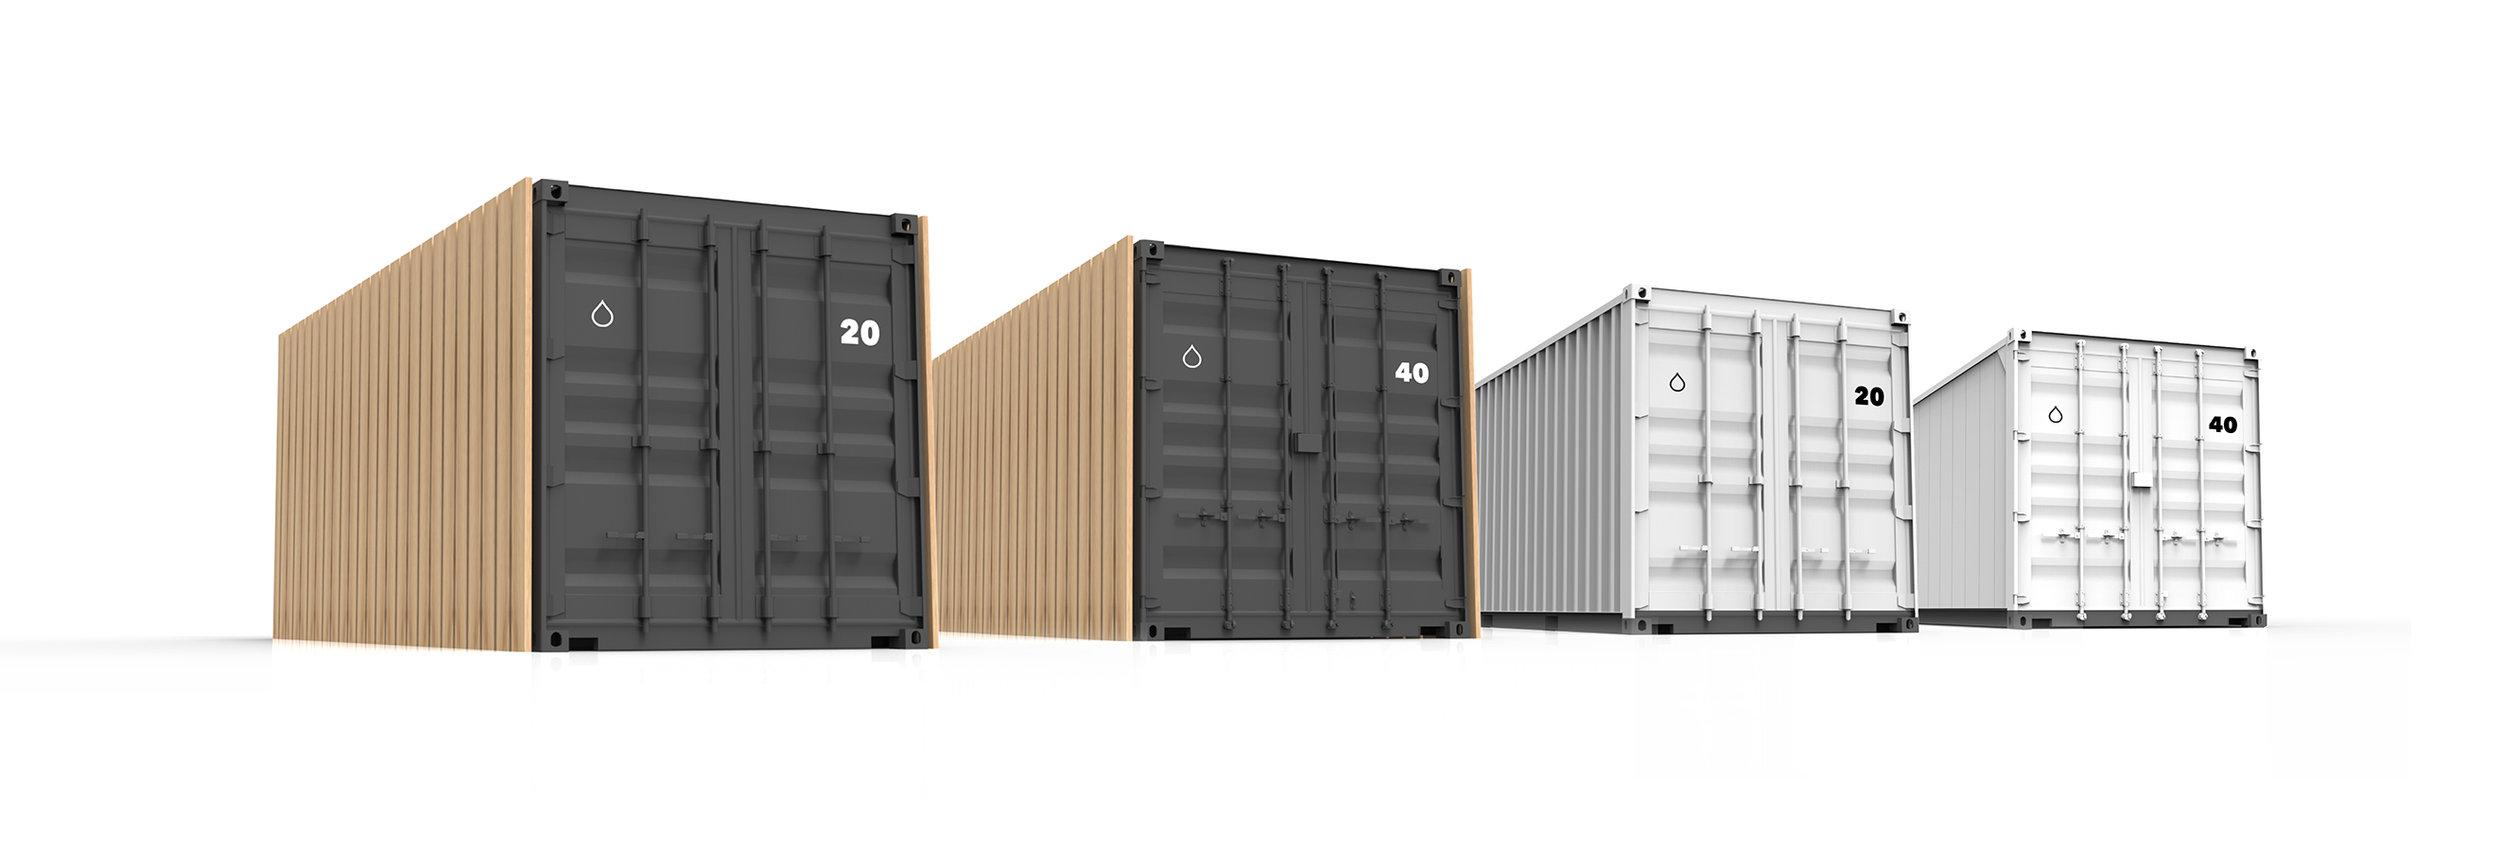 containersetup-05.jpg